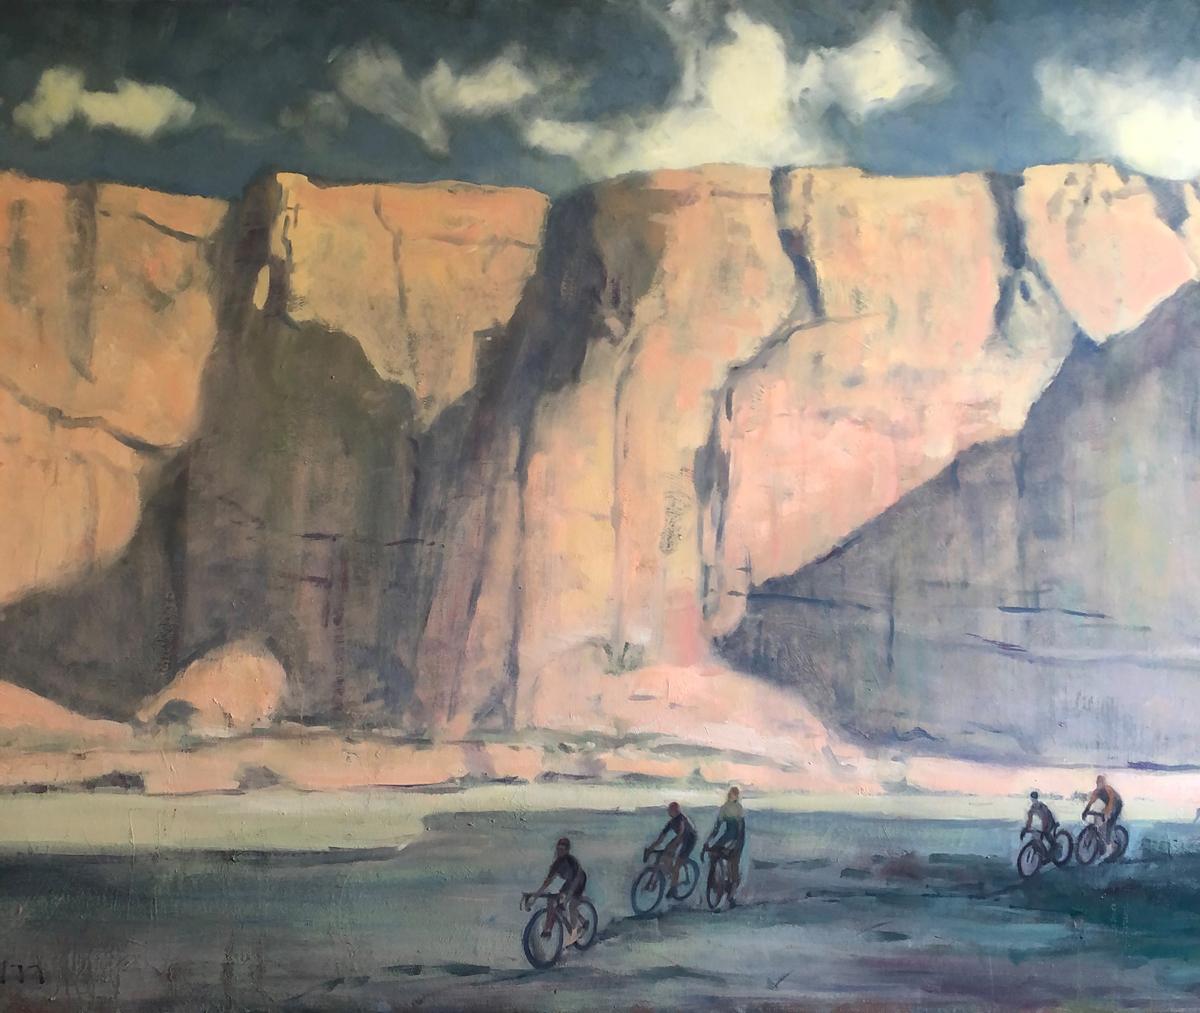 "Artist: Trenton Higley,Title: Desert Riders,Medium: Oil on canvas,Size: 36"" x 36"""